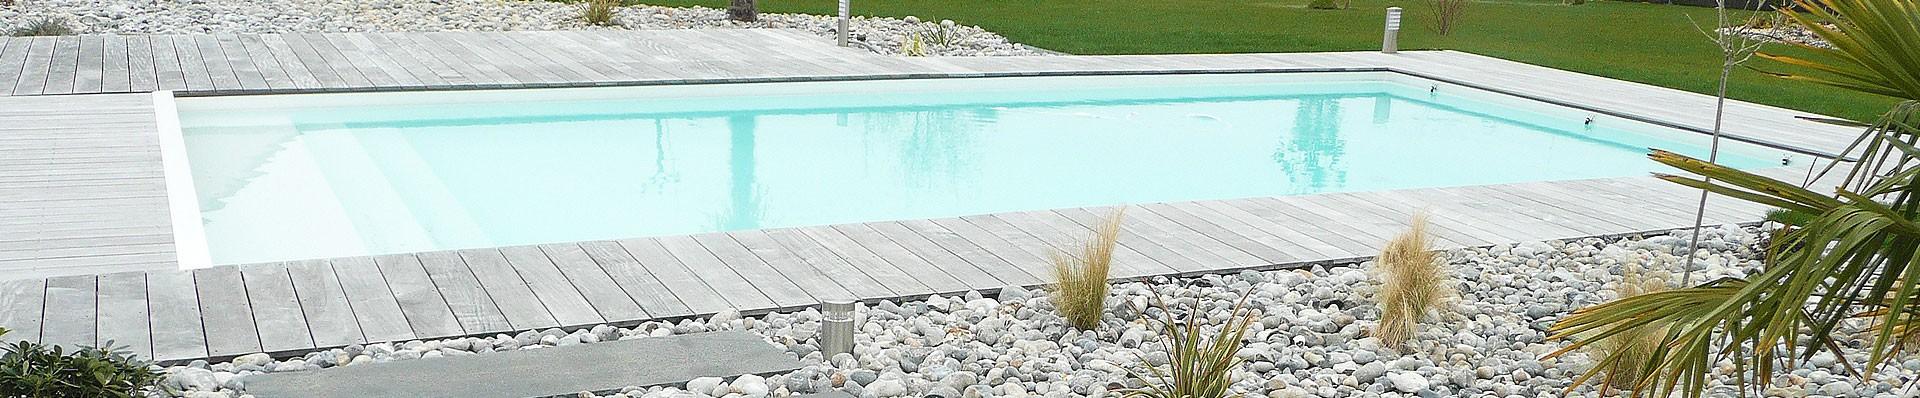 Constructeur de piscine angers 49 hydrath me for Constructeur de piscine